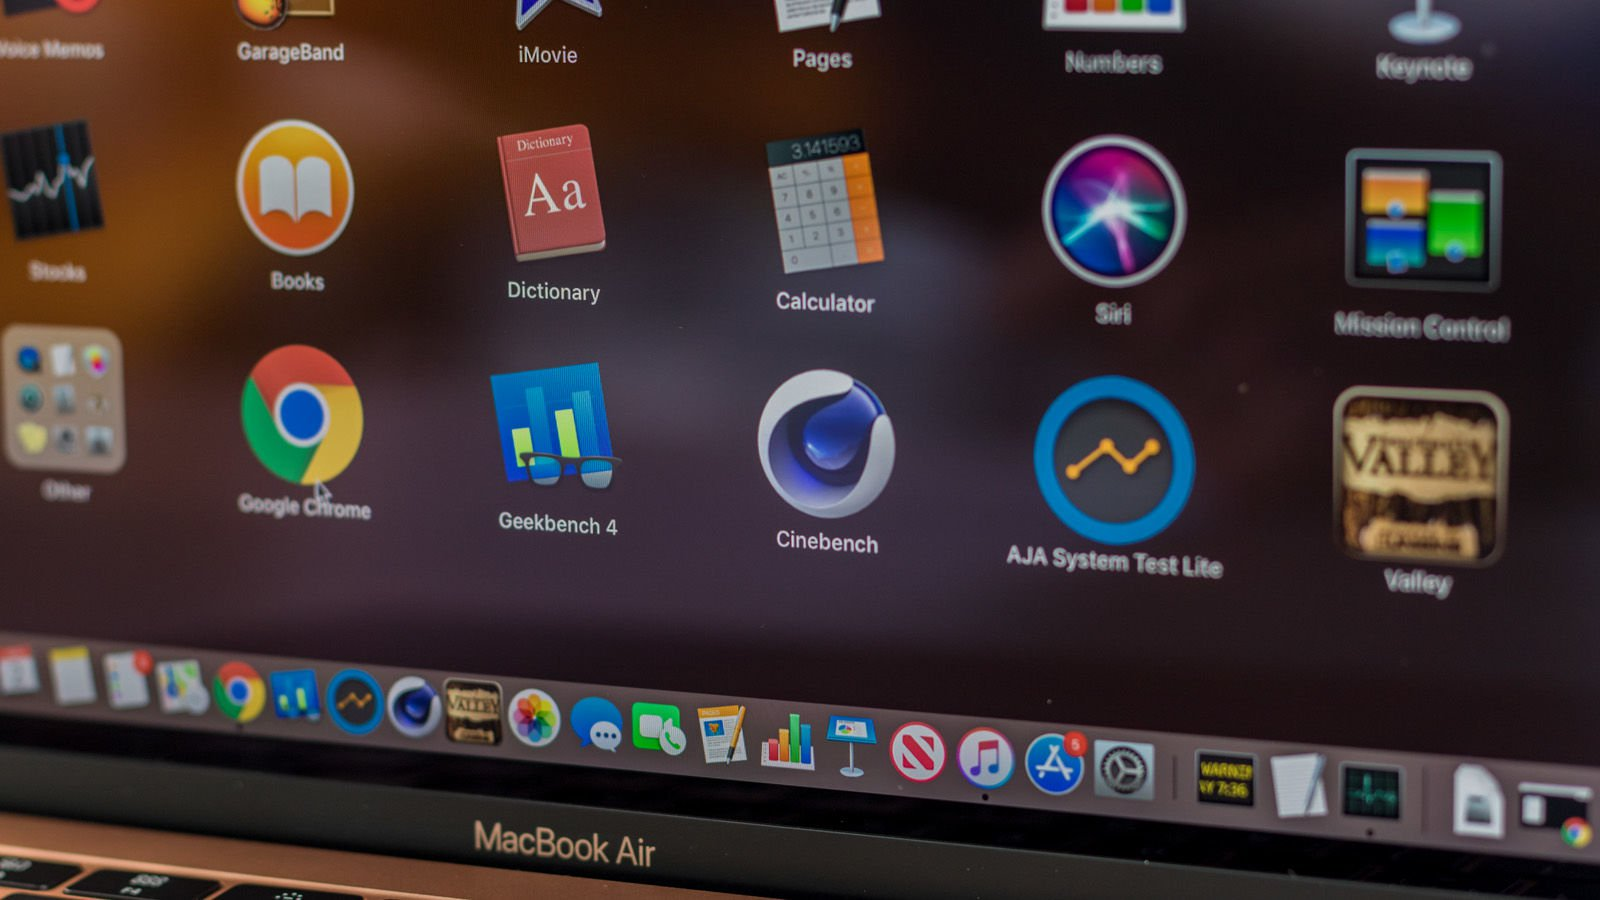 MacBook Air 2019 benchmarks